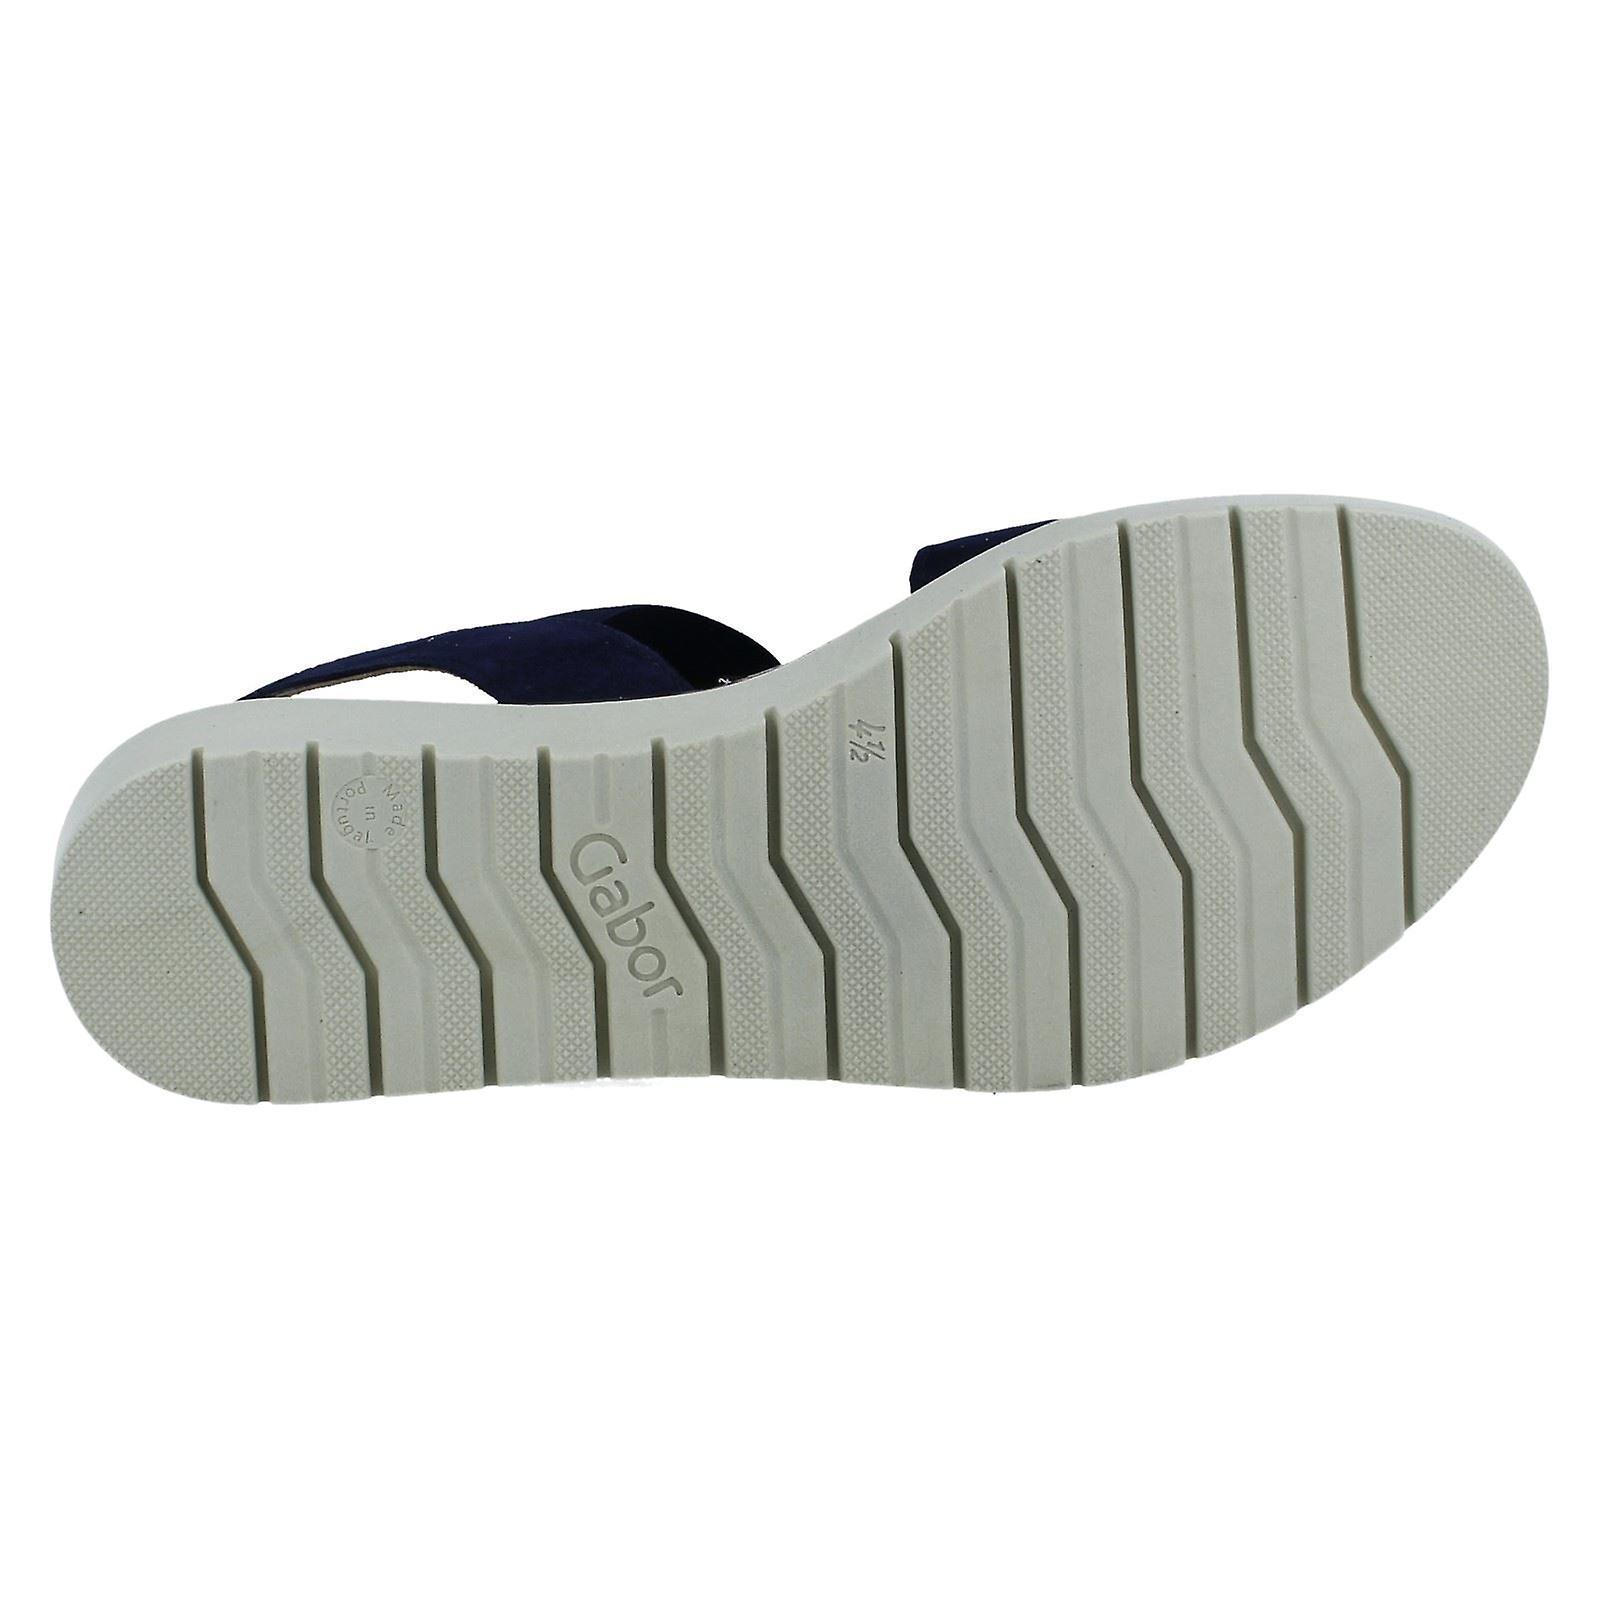 Ladies Gabor Slingbacks 24501 - Spesiell rabatt